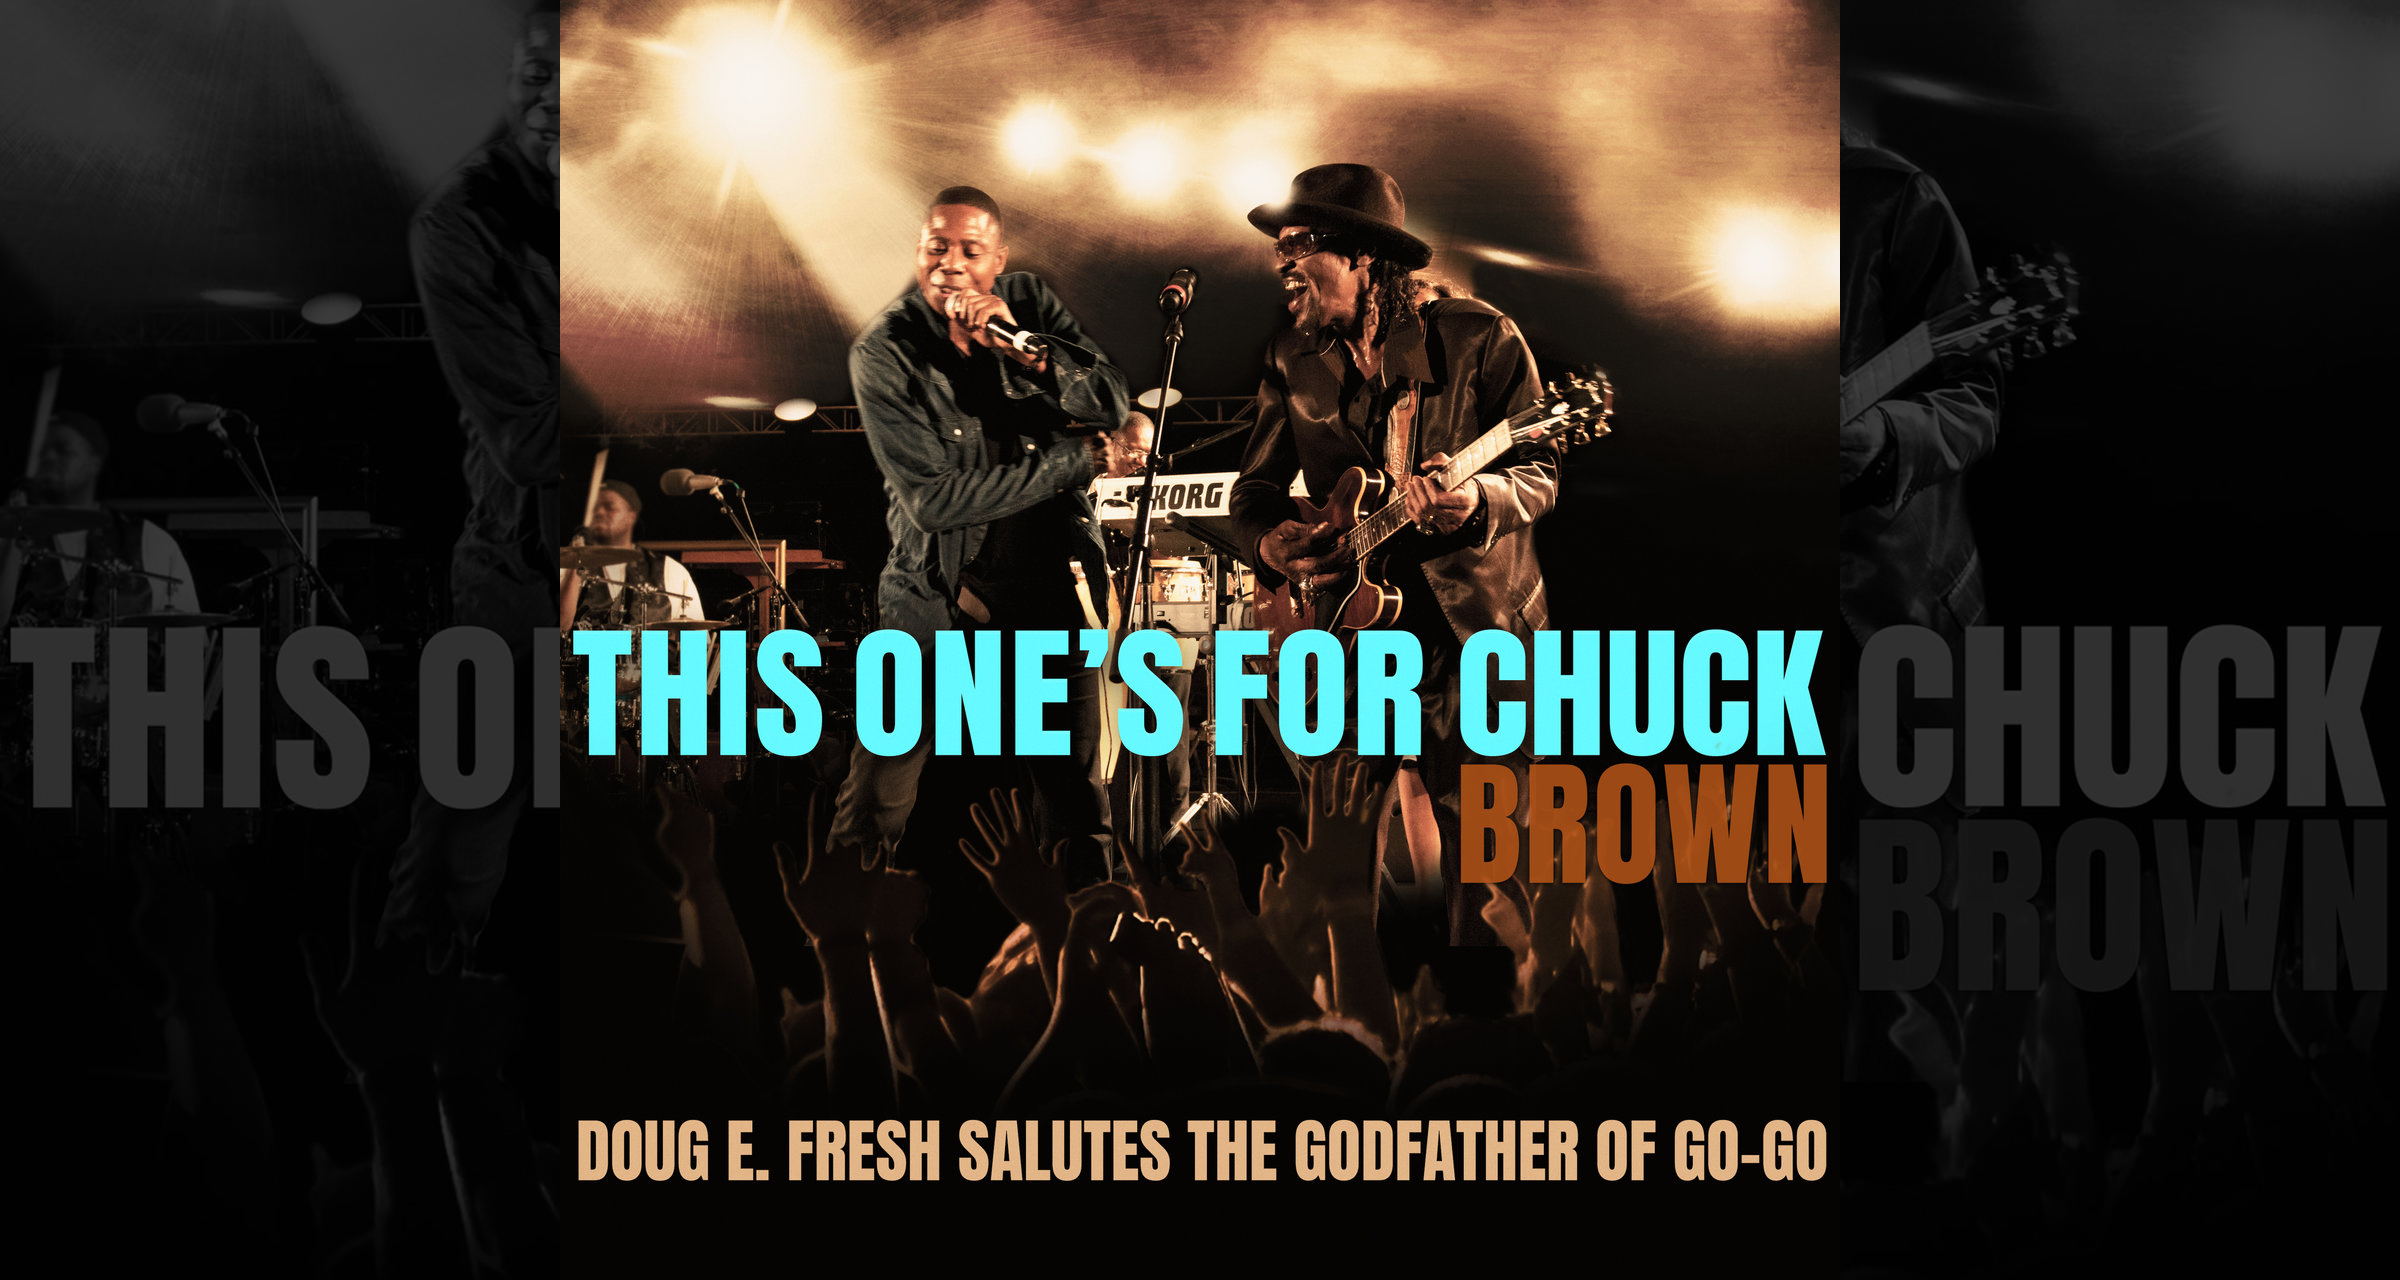 Doug E. Fresh's 'This One's for Chuck Brown' artwork